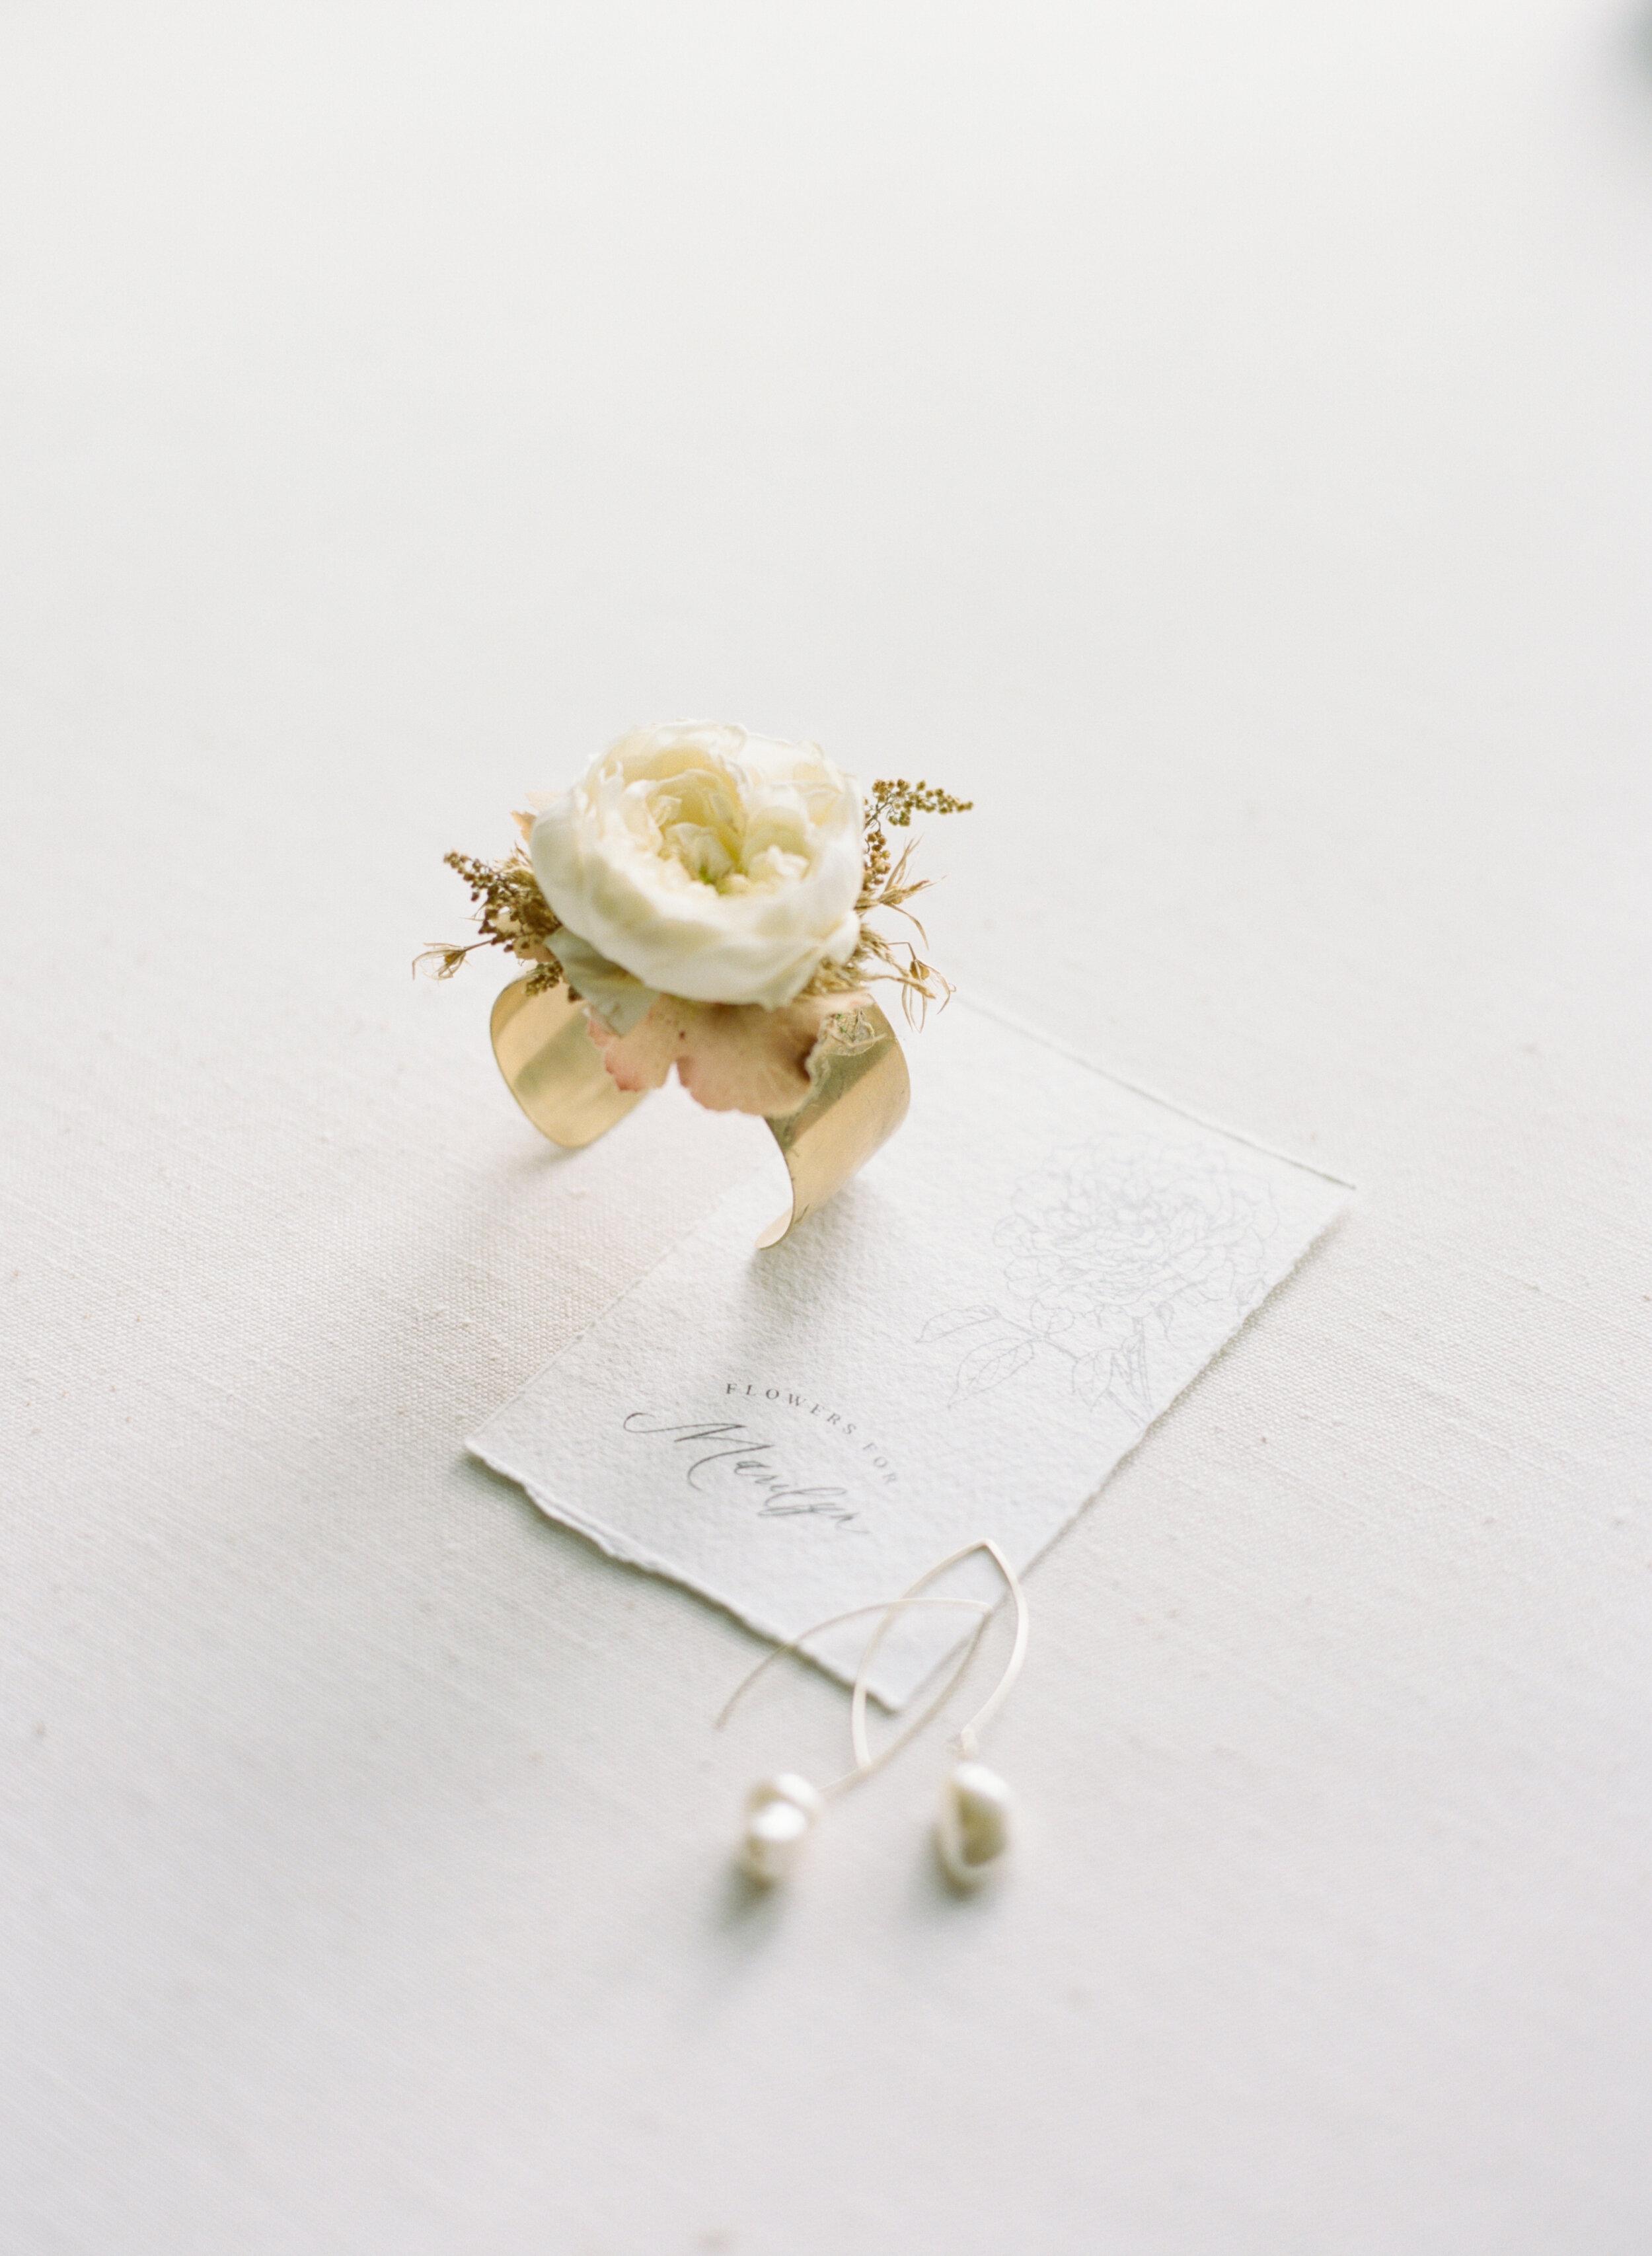 alexandra-meseke-understated-soft-luxury-wedding-upstate-ny_0012.jpg